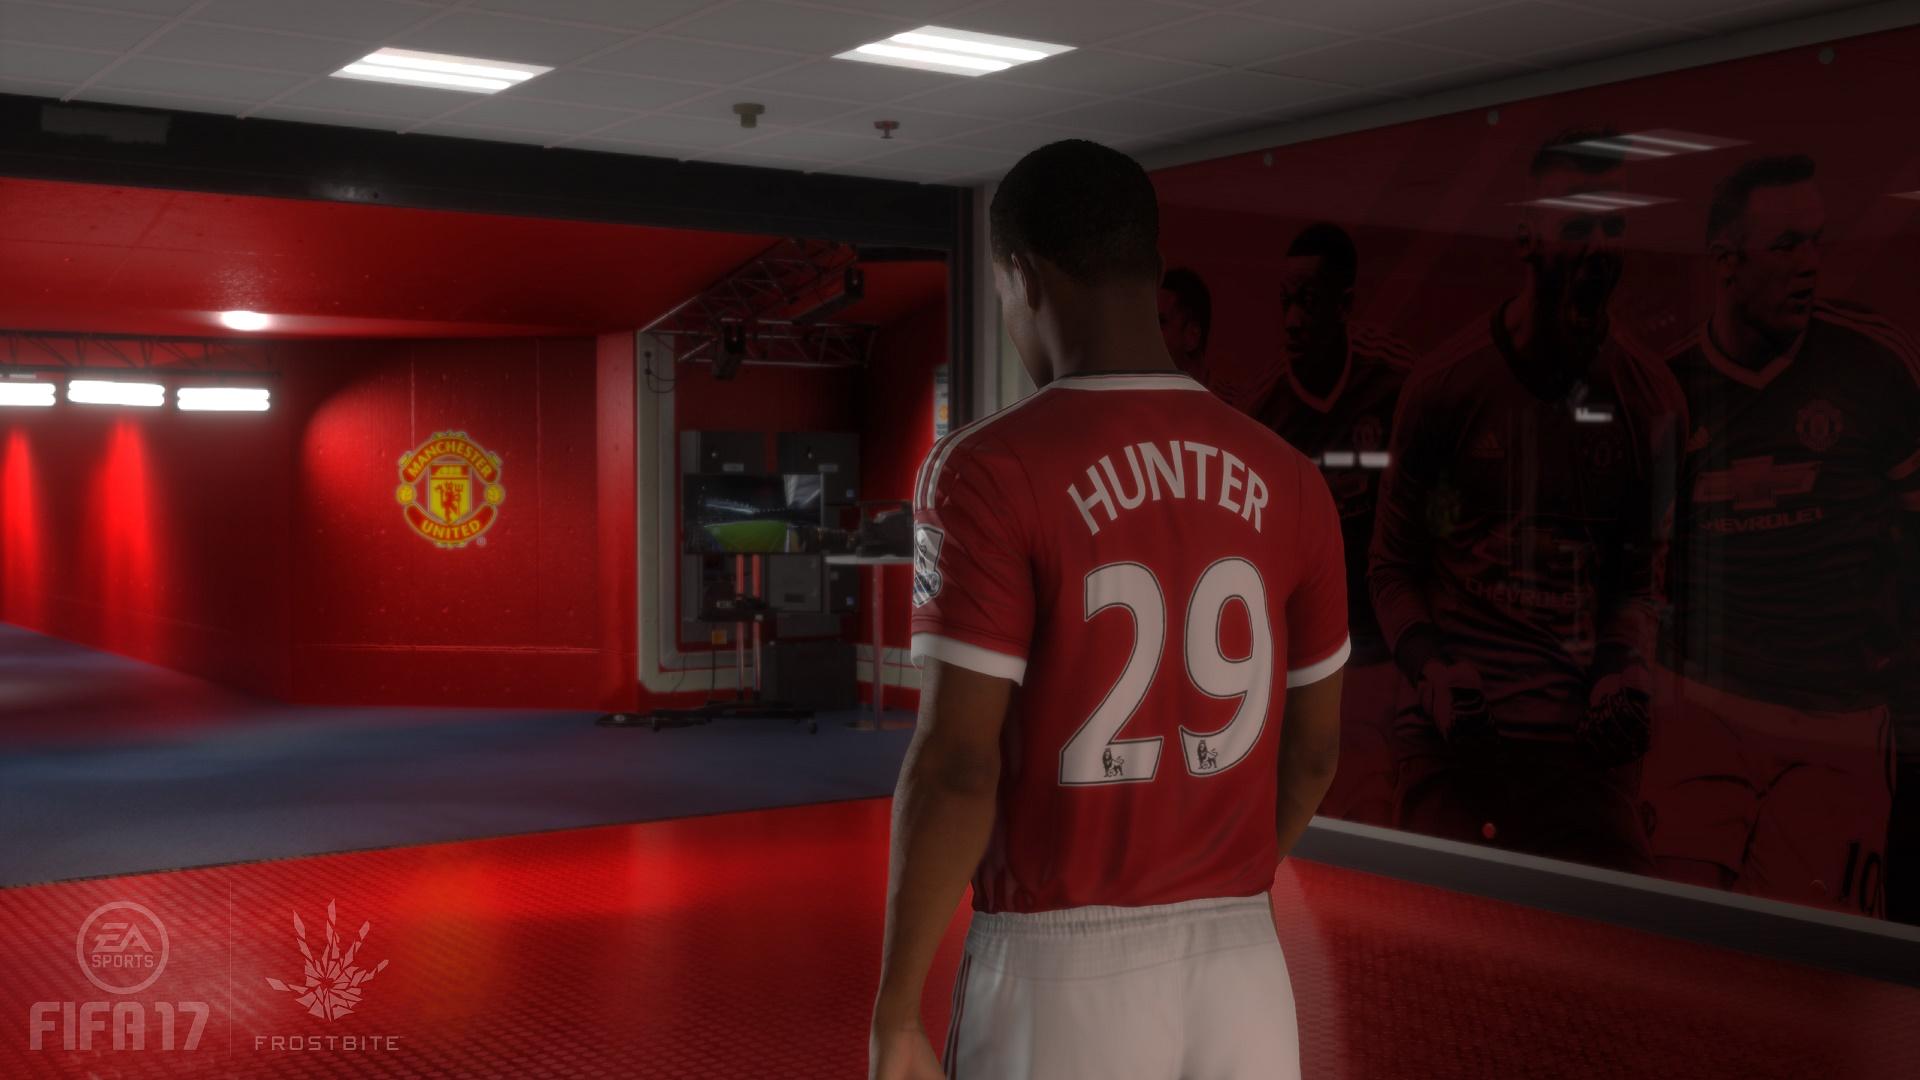 FIFA17_XB1_PS4_JOURNEY_HUNTER_UNITED_WM (1)